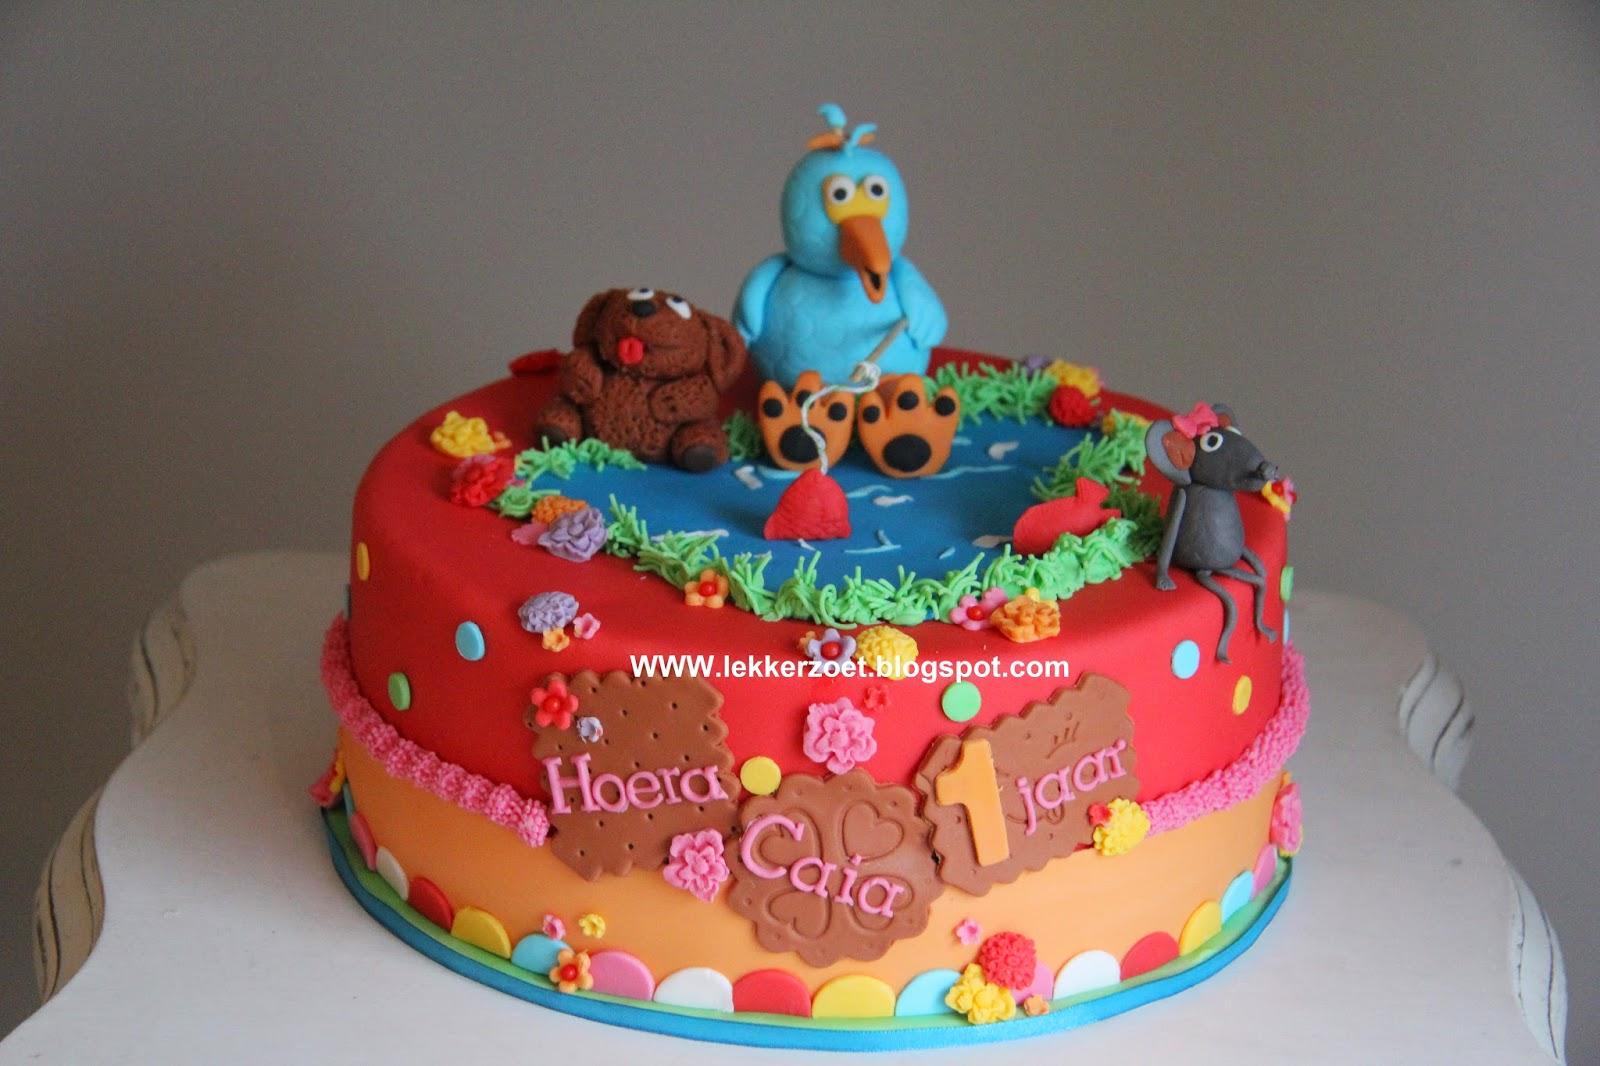 Populair lekker zoet: Sesamstraat taart met koekie monster als mep taartje  @ZV68